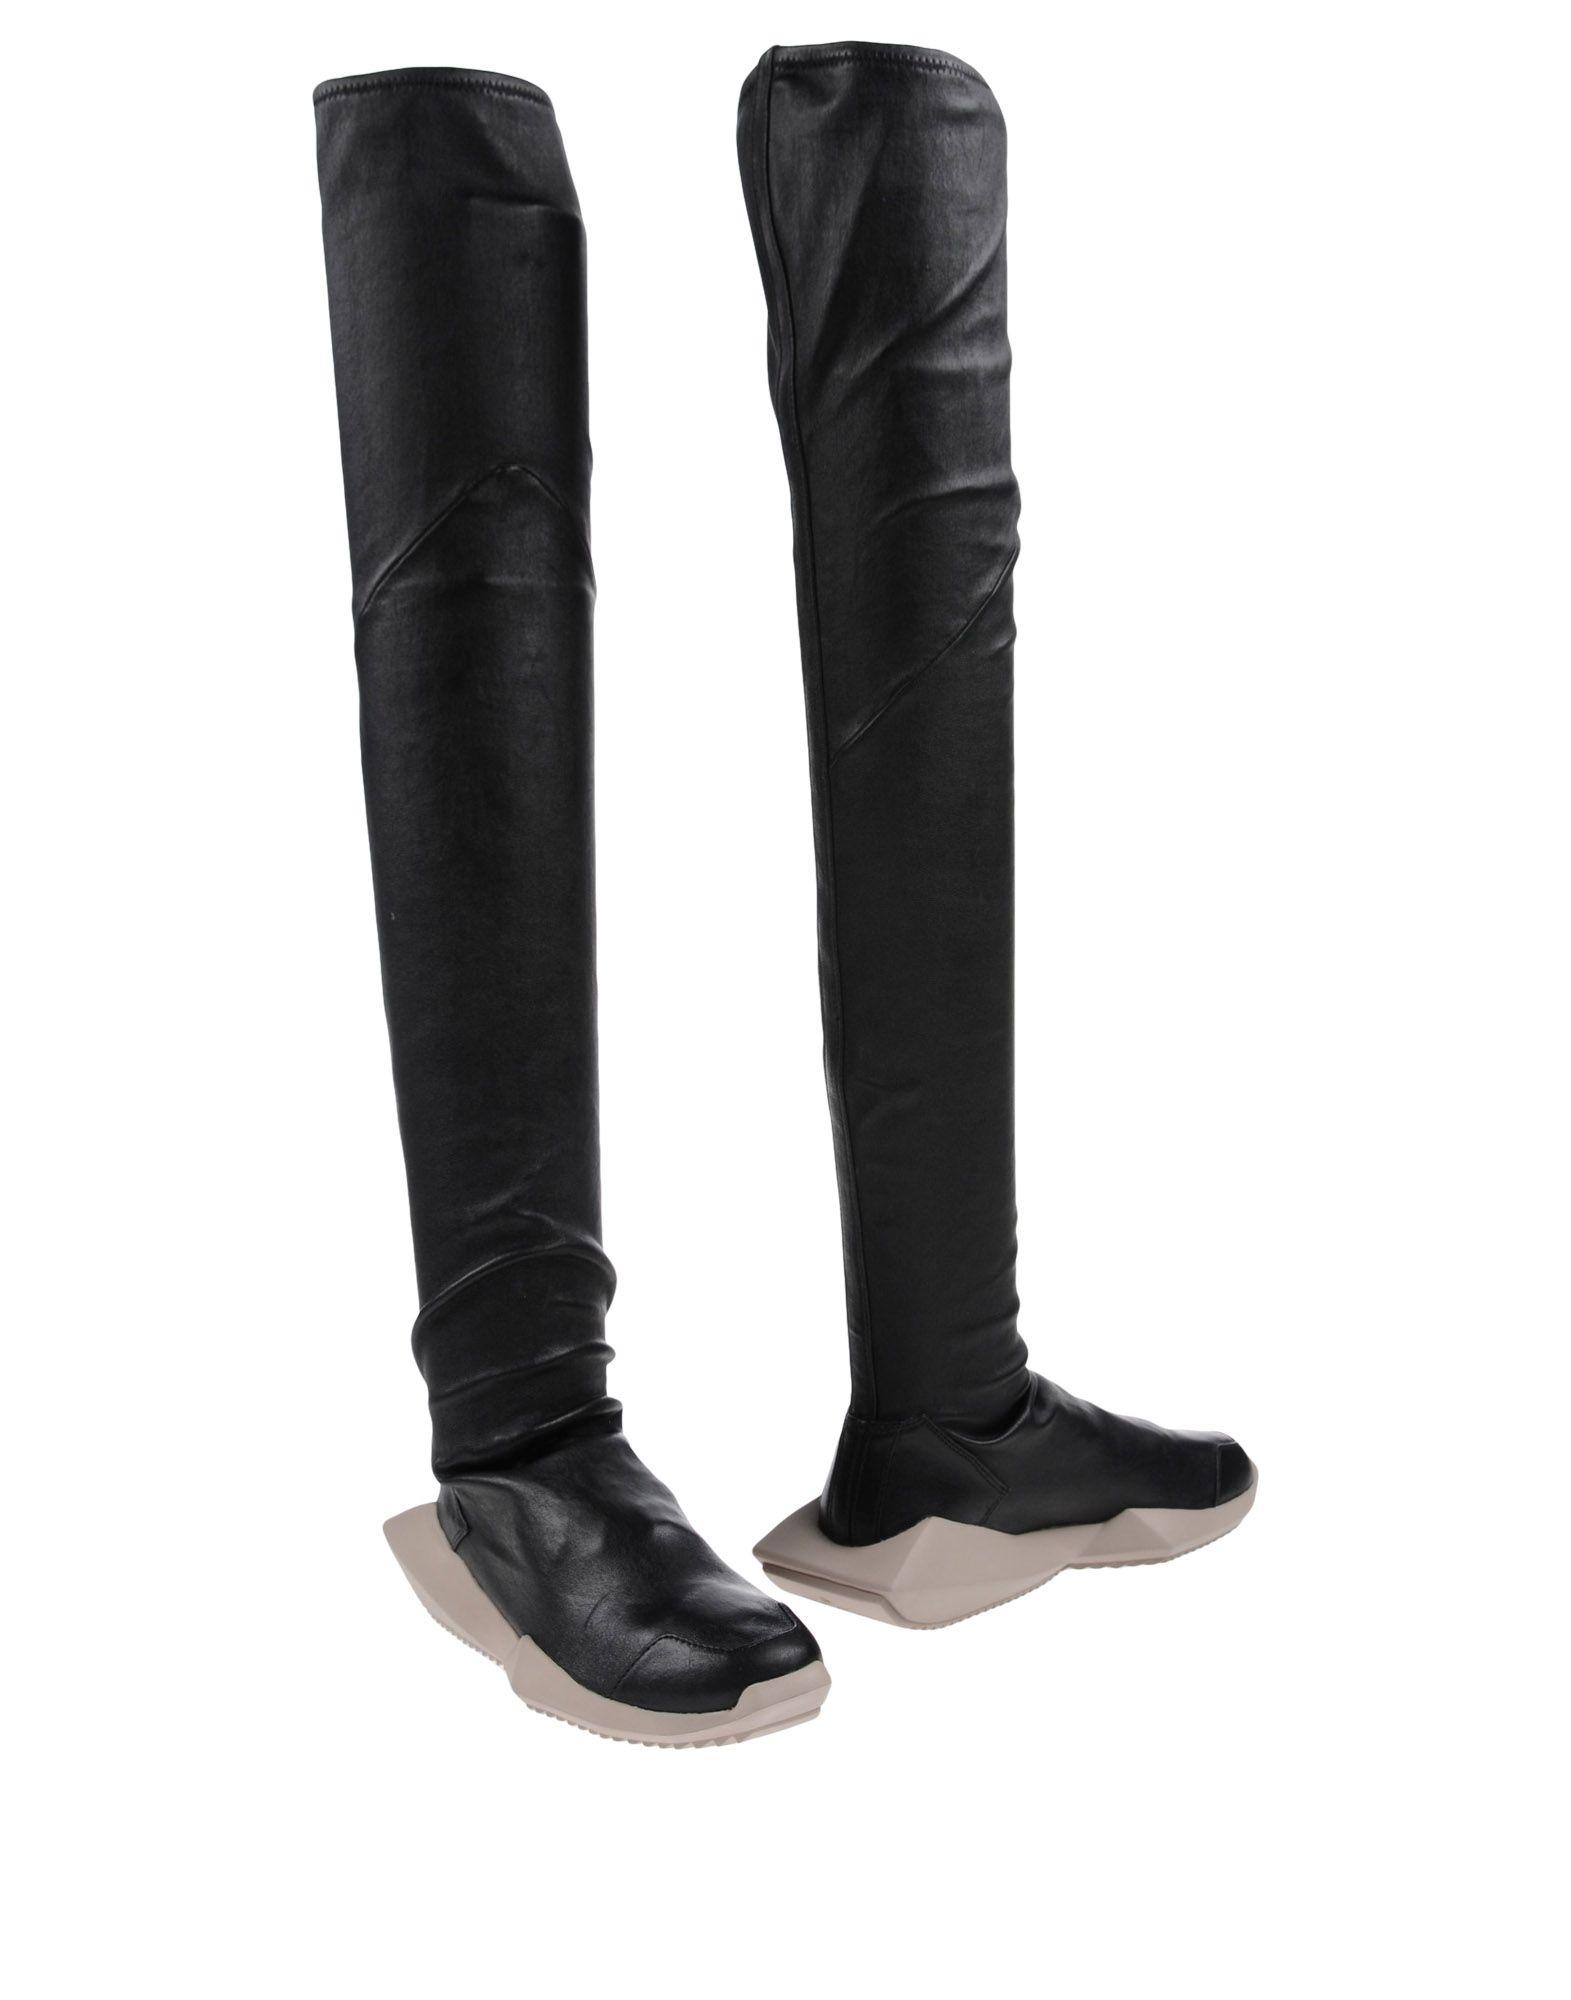 Stivali Rick Owens X Adidas Donna - Acquista online su